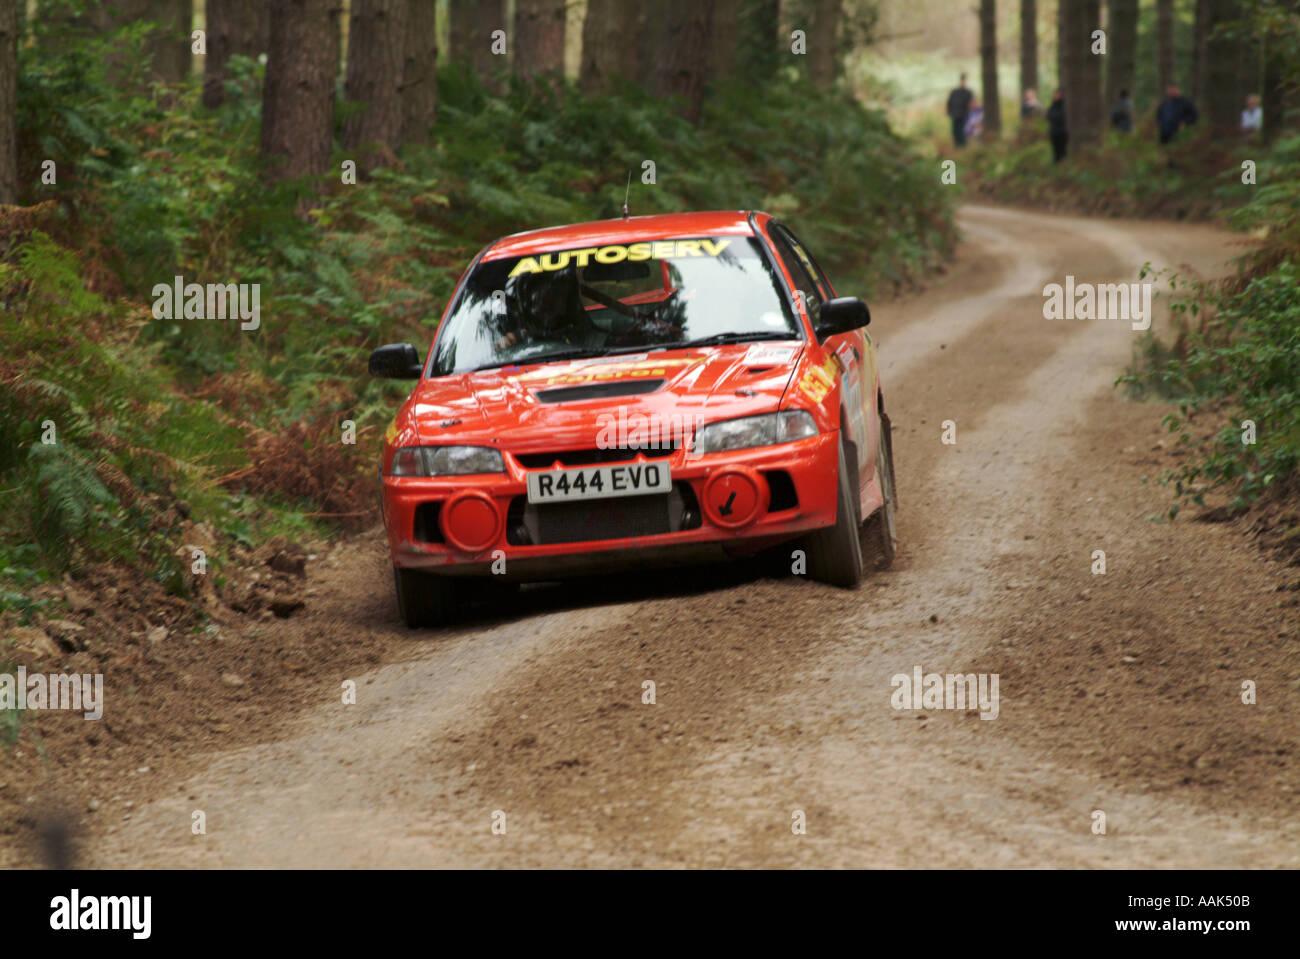 mitsubishi evo evolution rally car rallying off road speed fast ...